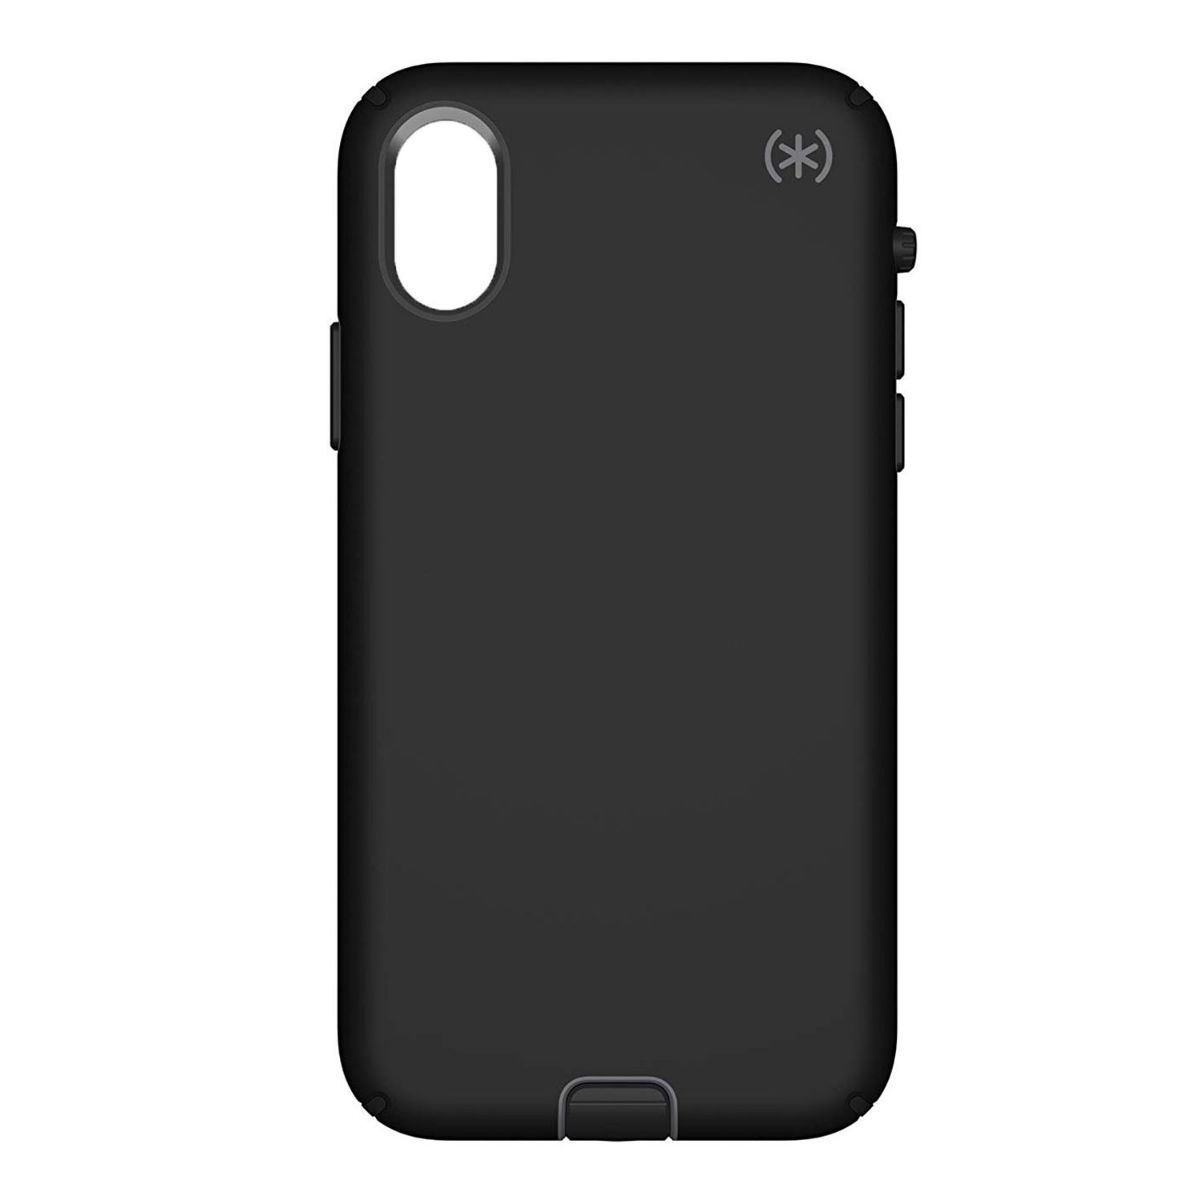 Speck Presidio Sport Hybrid Case for Apple iPhone X - Black / Gunmetal Gray